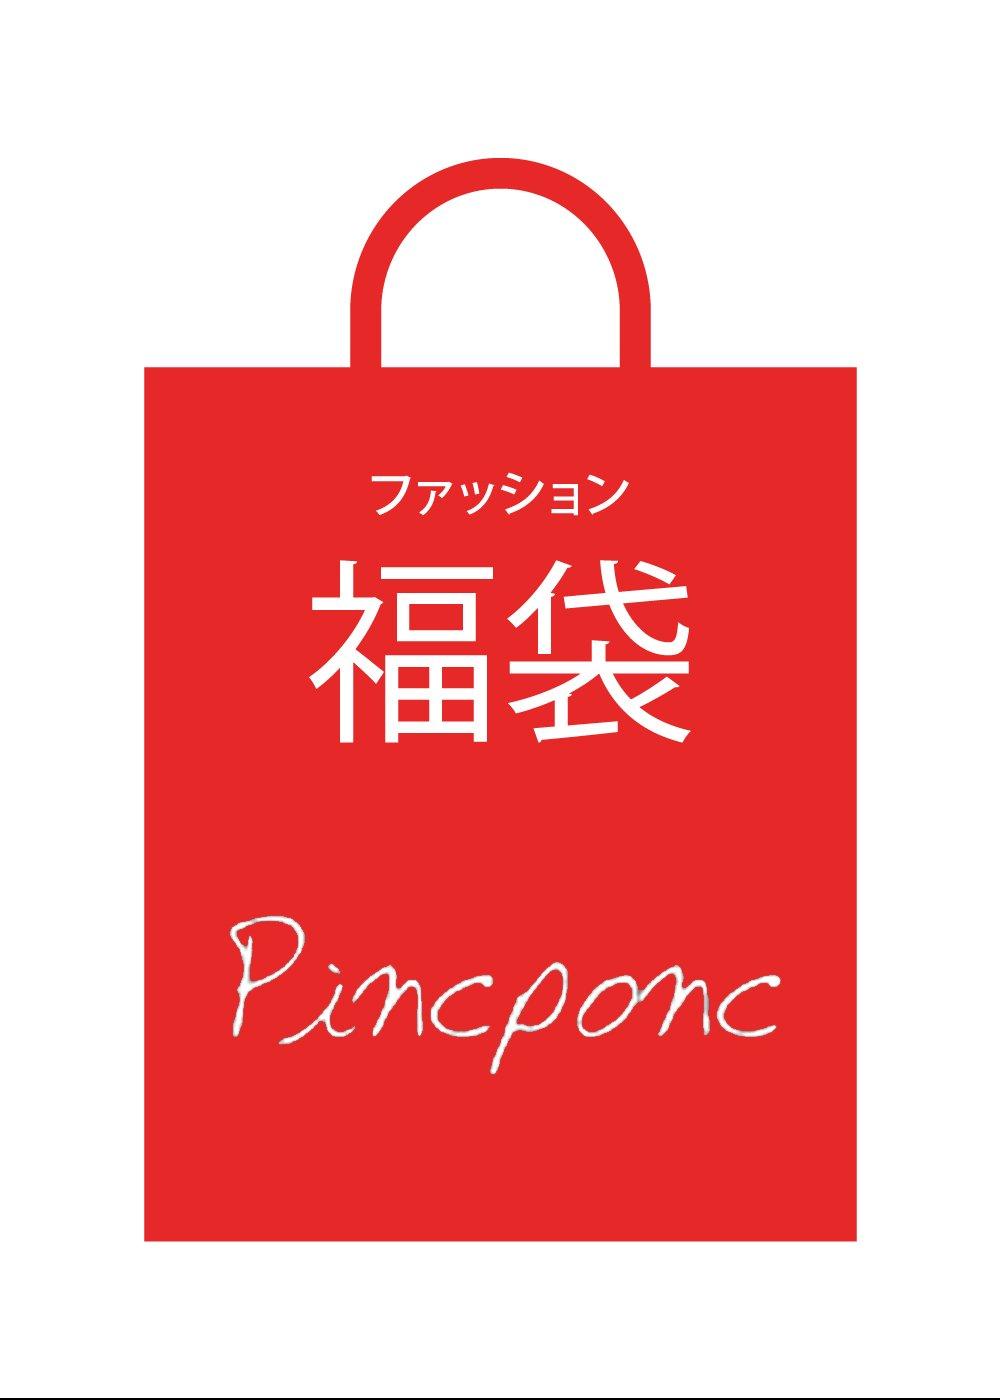 Amazon 人気ブランド ファッション福袋 送料込1050円から